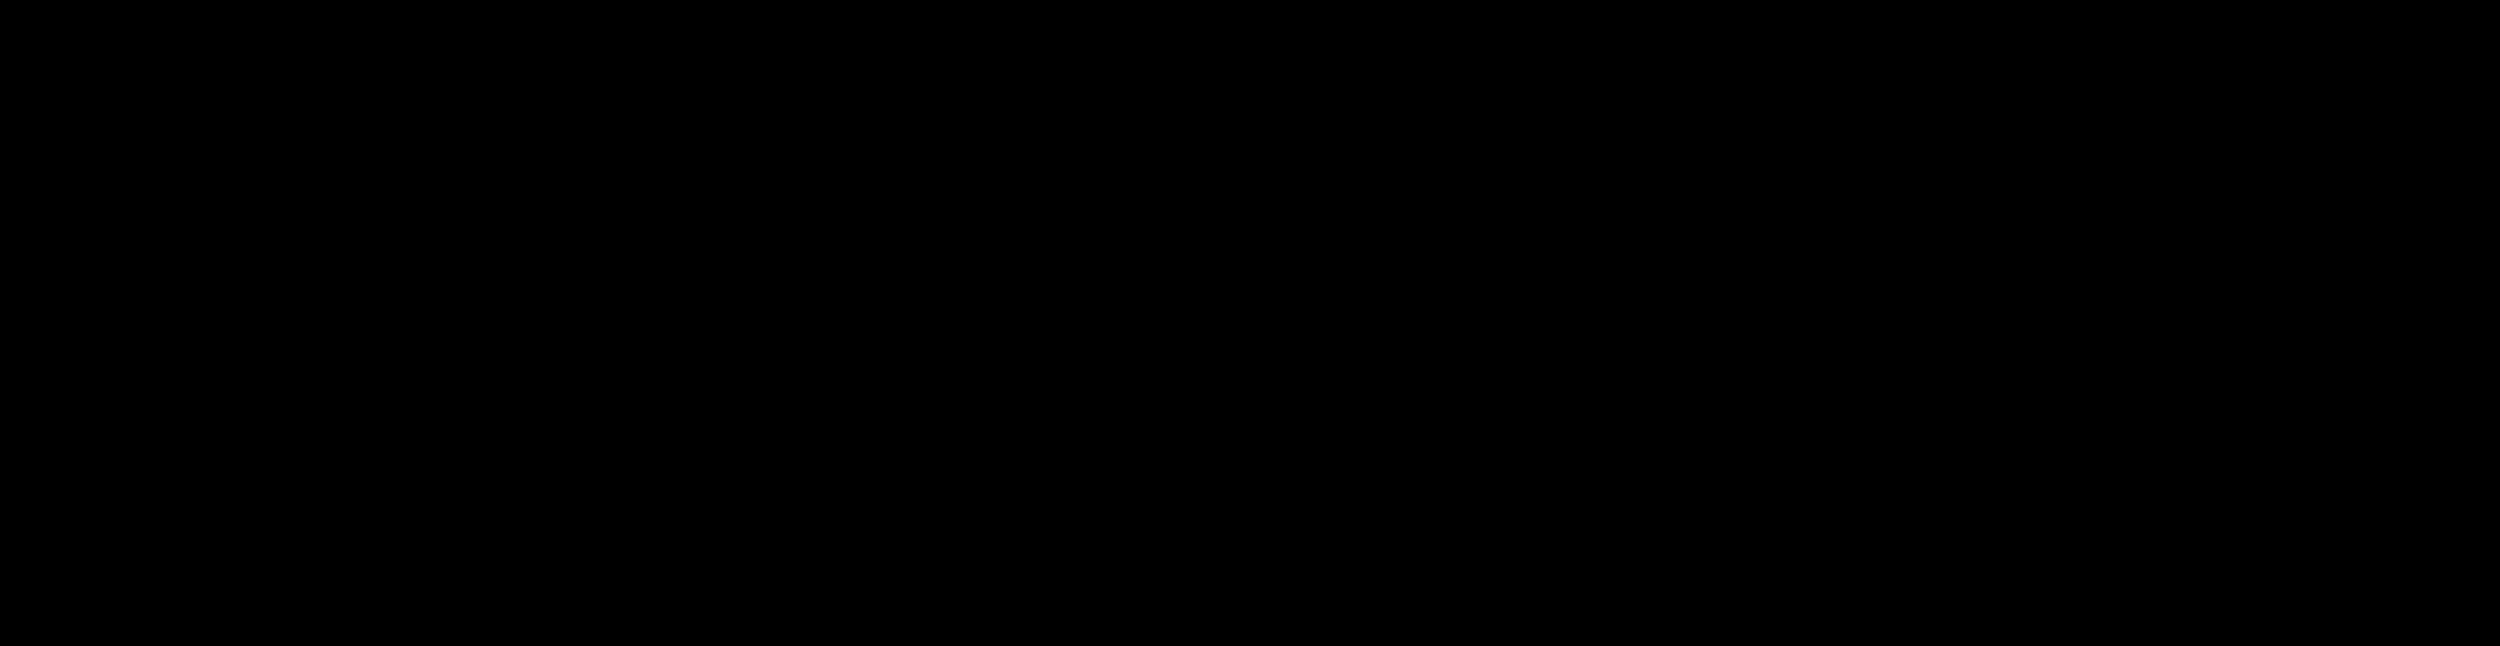 Osteria_Locale_logo_vaaka.png